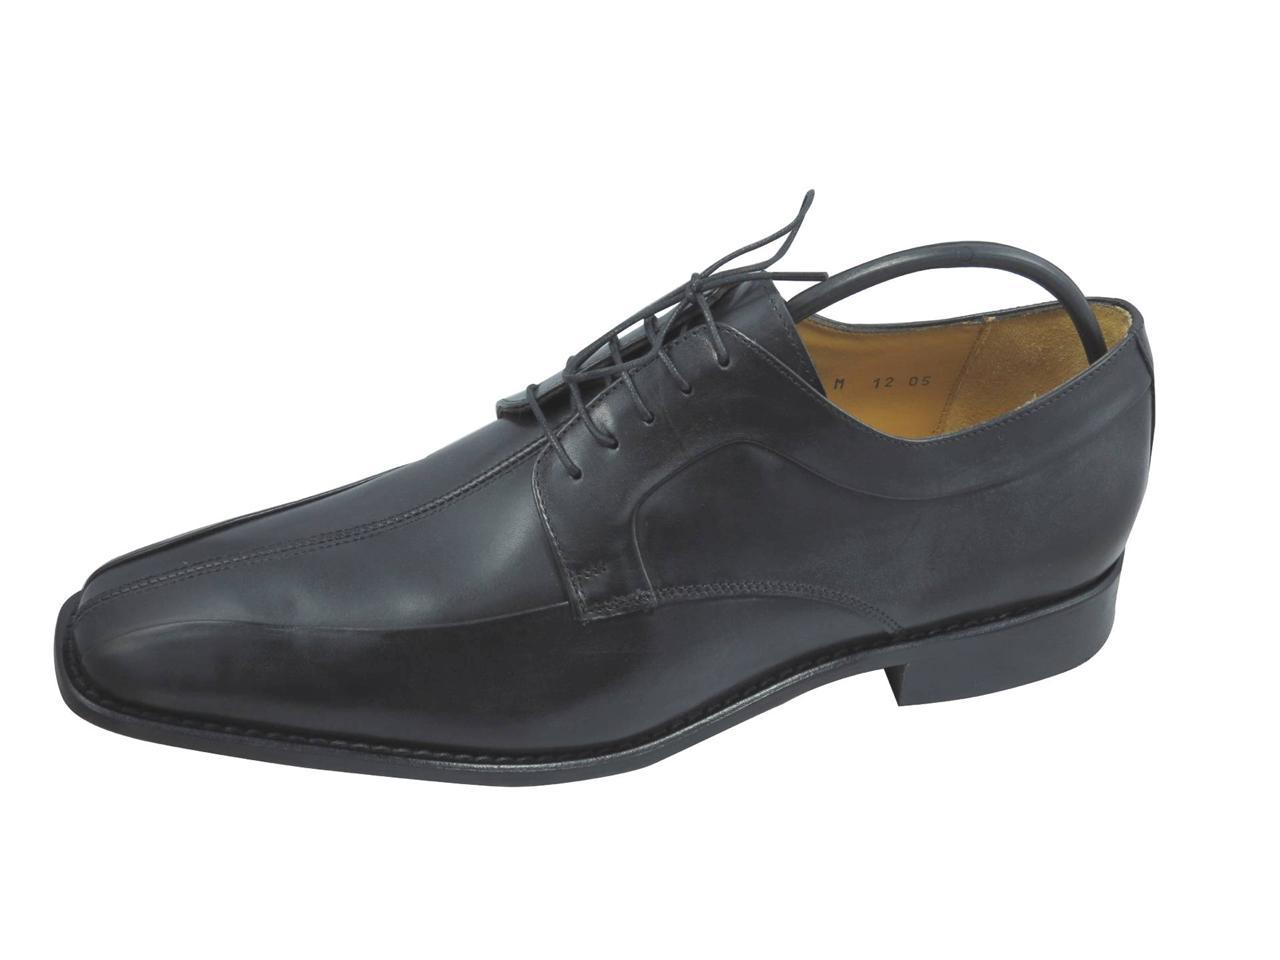 Brass Boot Eastman Menu0026#39;s Lace Up Shoes Black | EBay